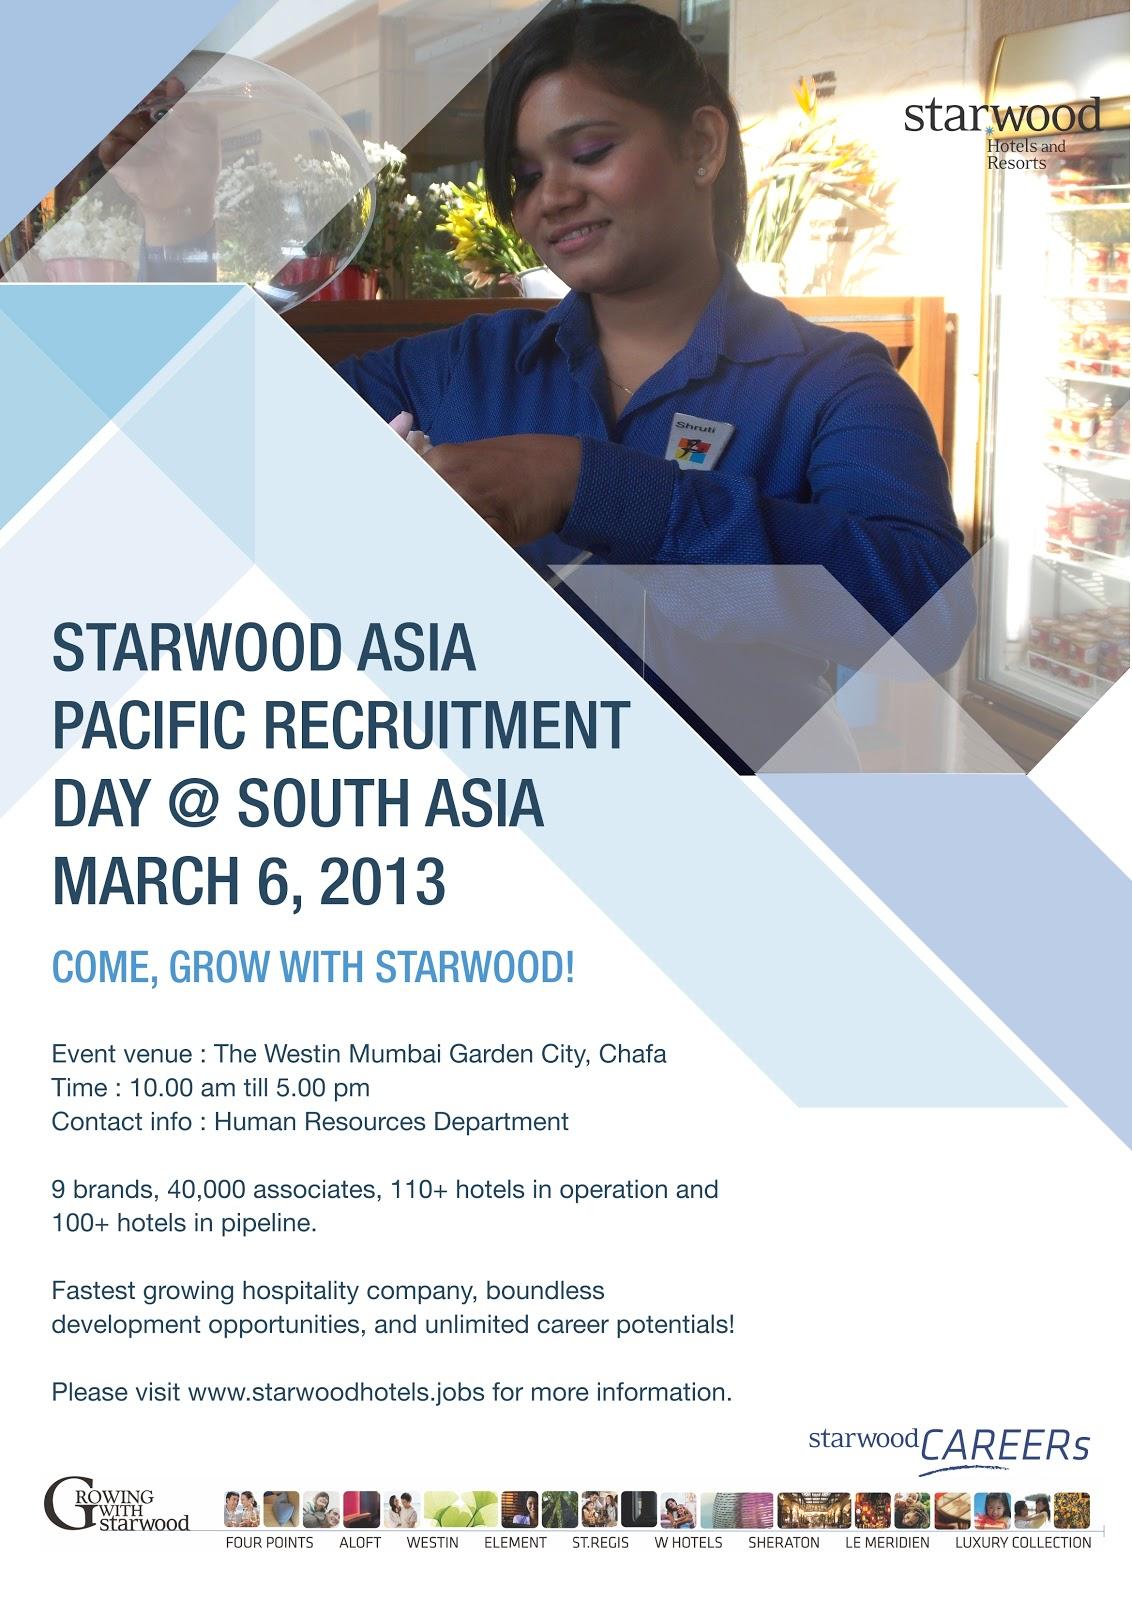 The Westin Mumbai Garden City Starwood Asia Pacific Recruitment Day